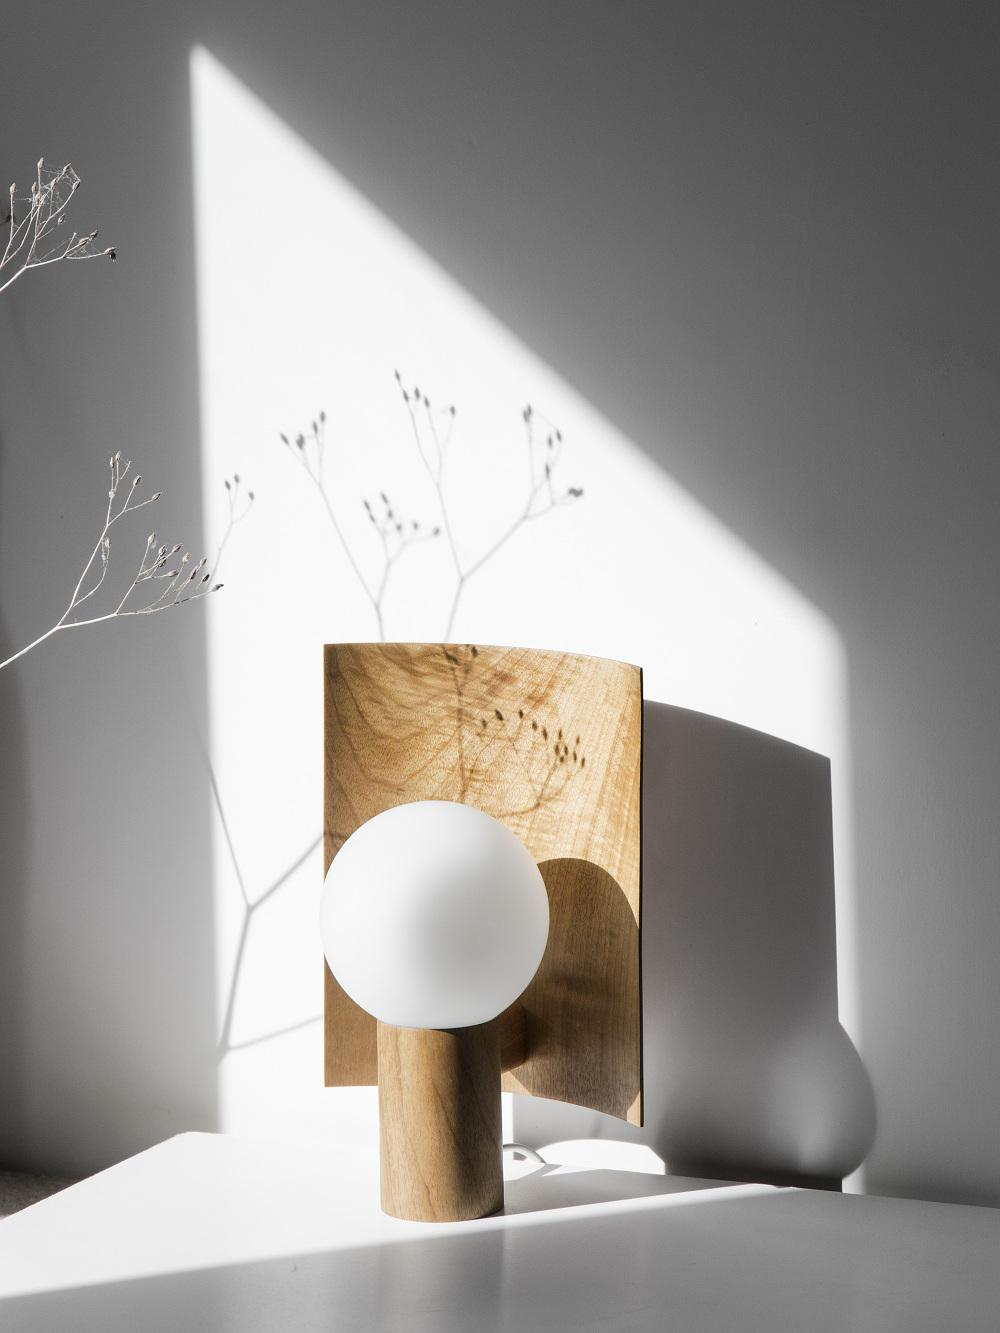 Autumn Lamp designed by Ferréol Babin